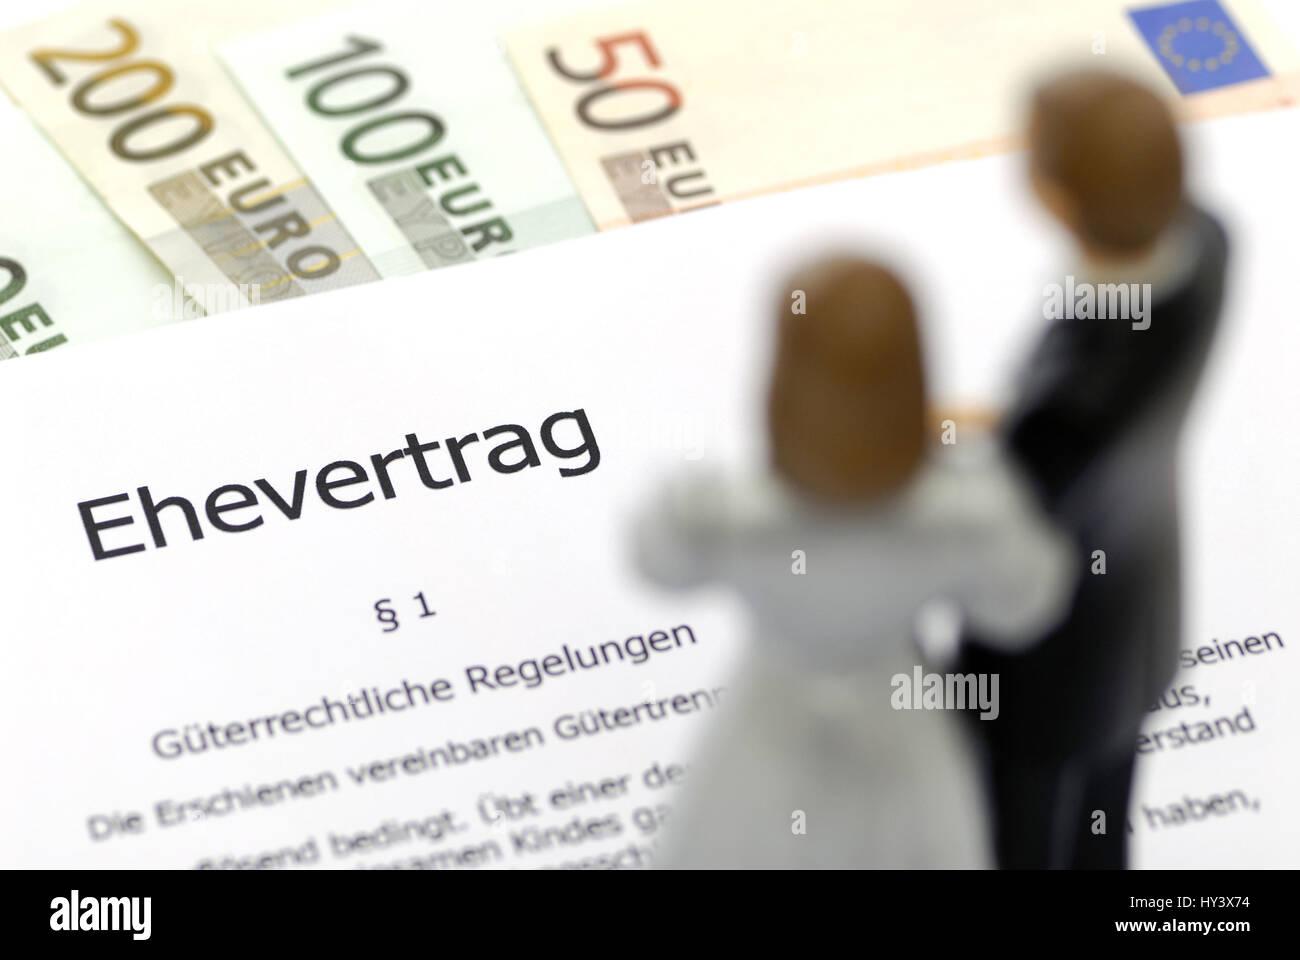 Marriage contract ehevertrag stock photo 137154728 alamy marriage contract ehevertrag thecheapjerseys Choice Image